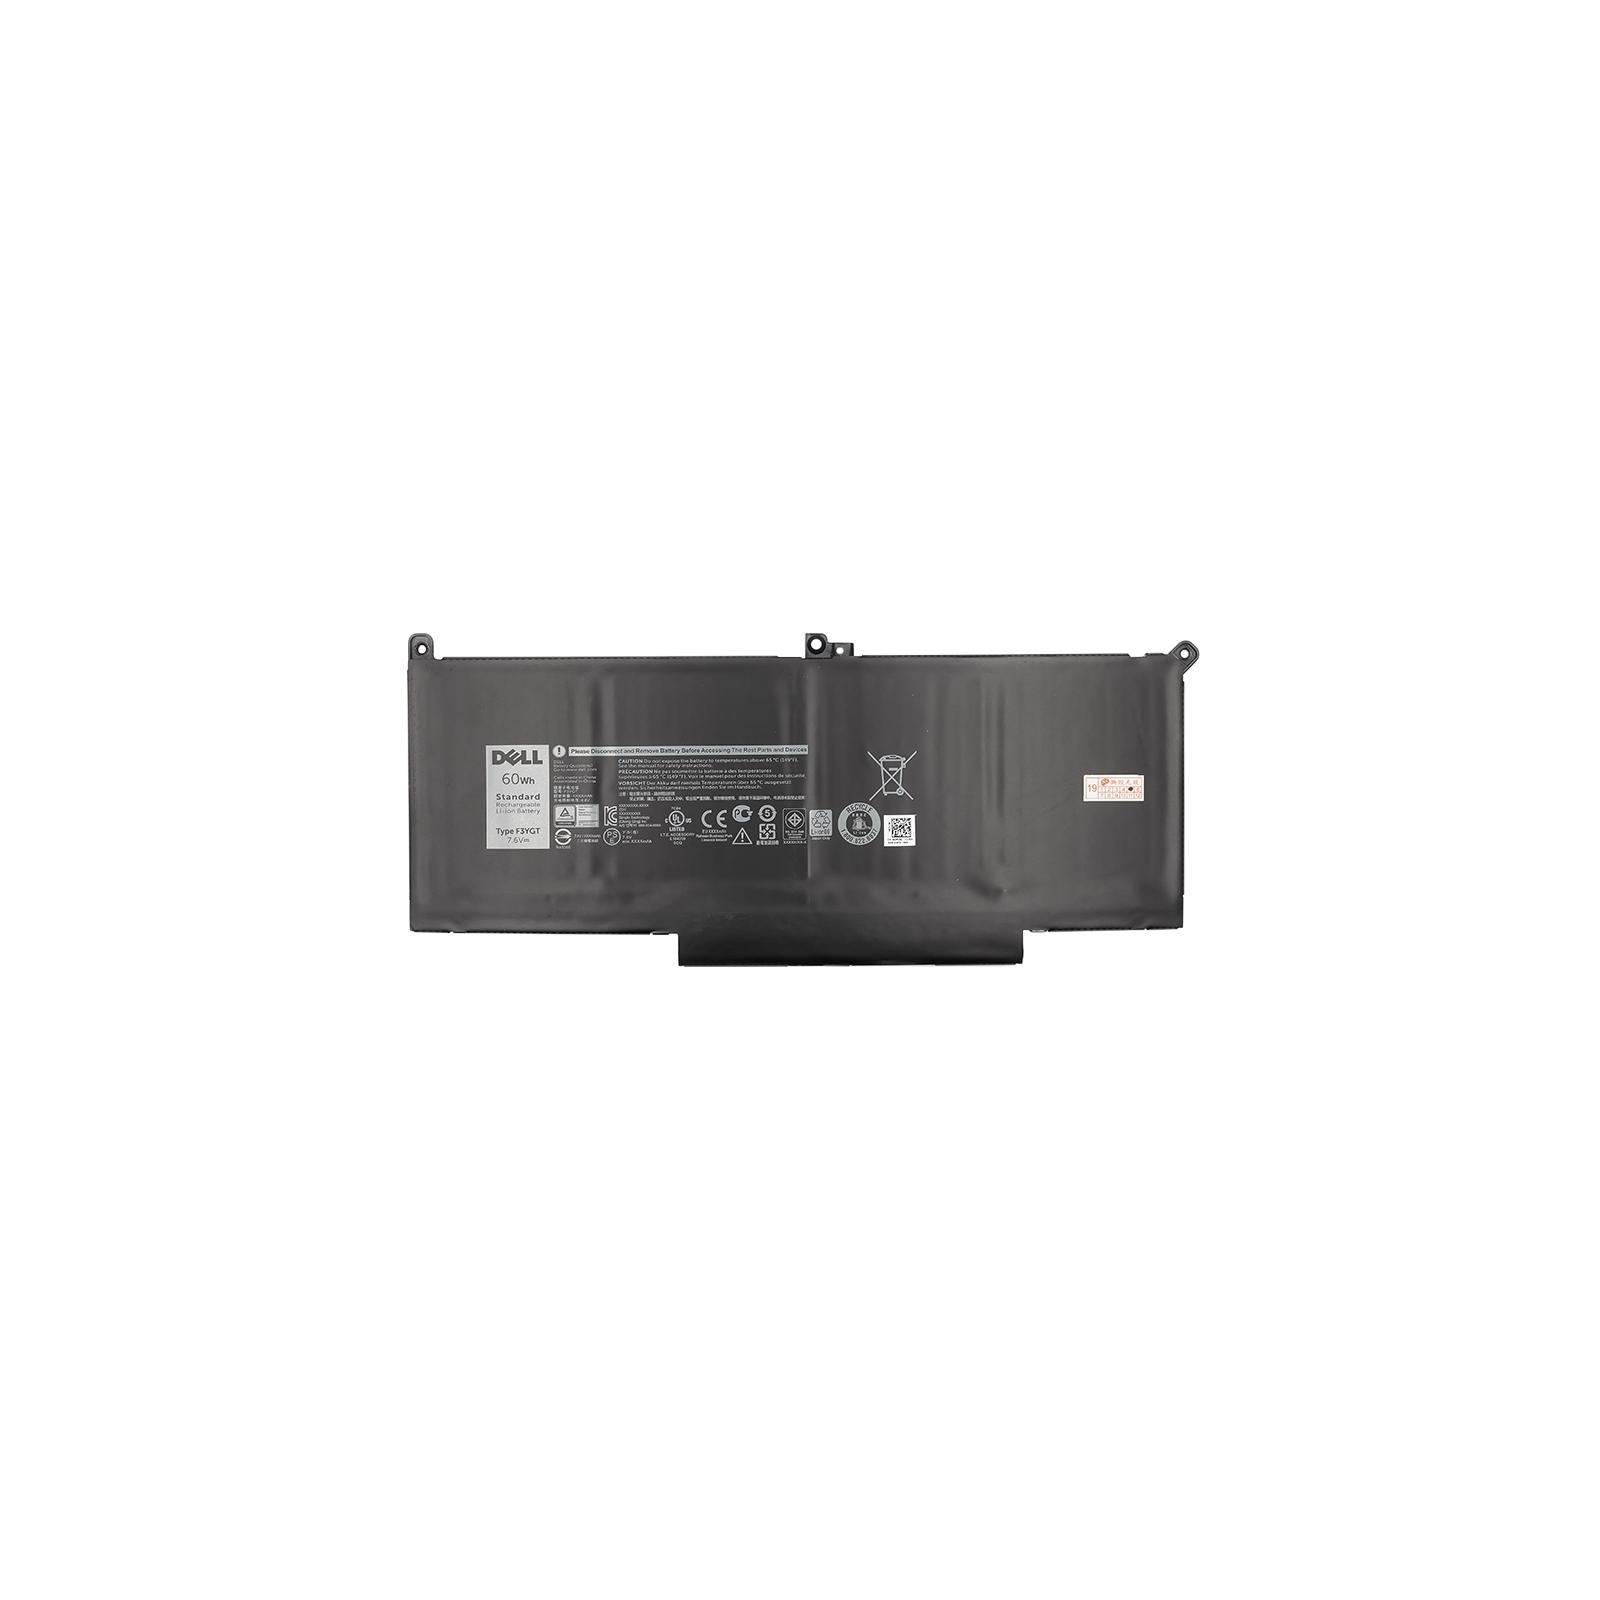 Аккумулятор для ноутбука DELL Latitude 7280 (DM3WC) 7.6V 60Wh PowerPlant (NB441167) изображение 2